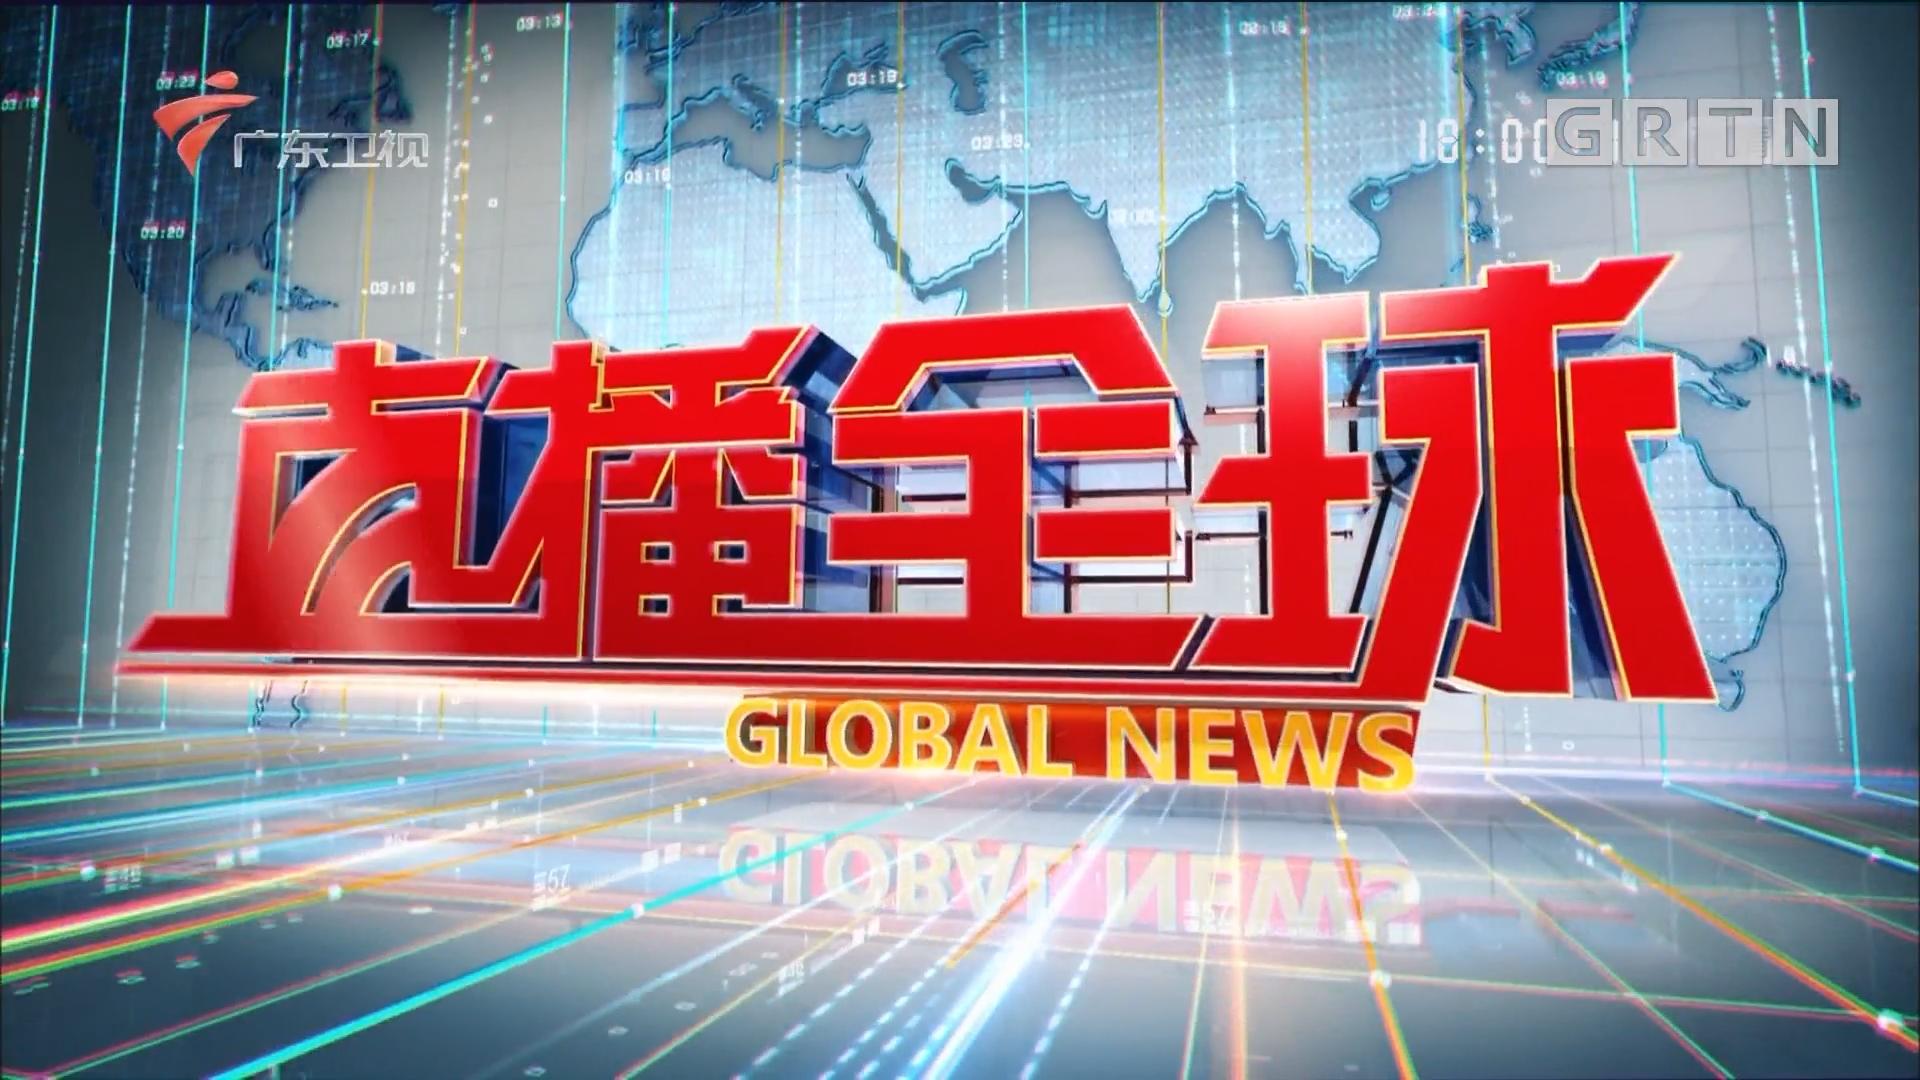 [HD][2018-06-12]直播全球:金正恩与特朗普在新加坡举行会晤 历史性握手持续10秒钟